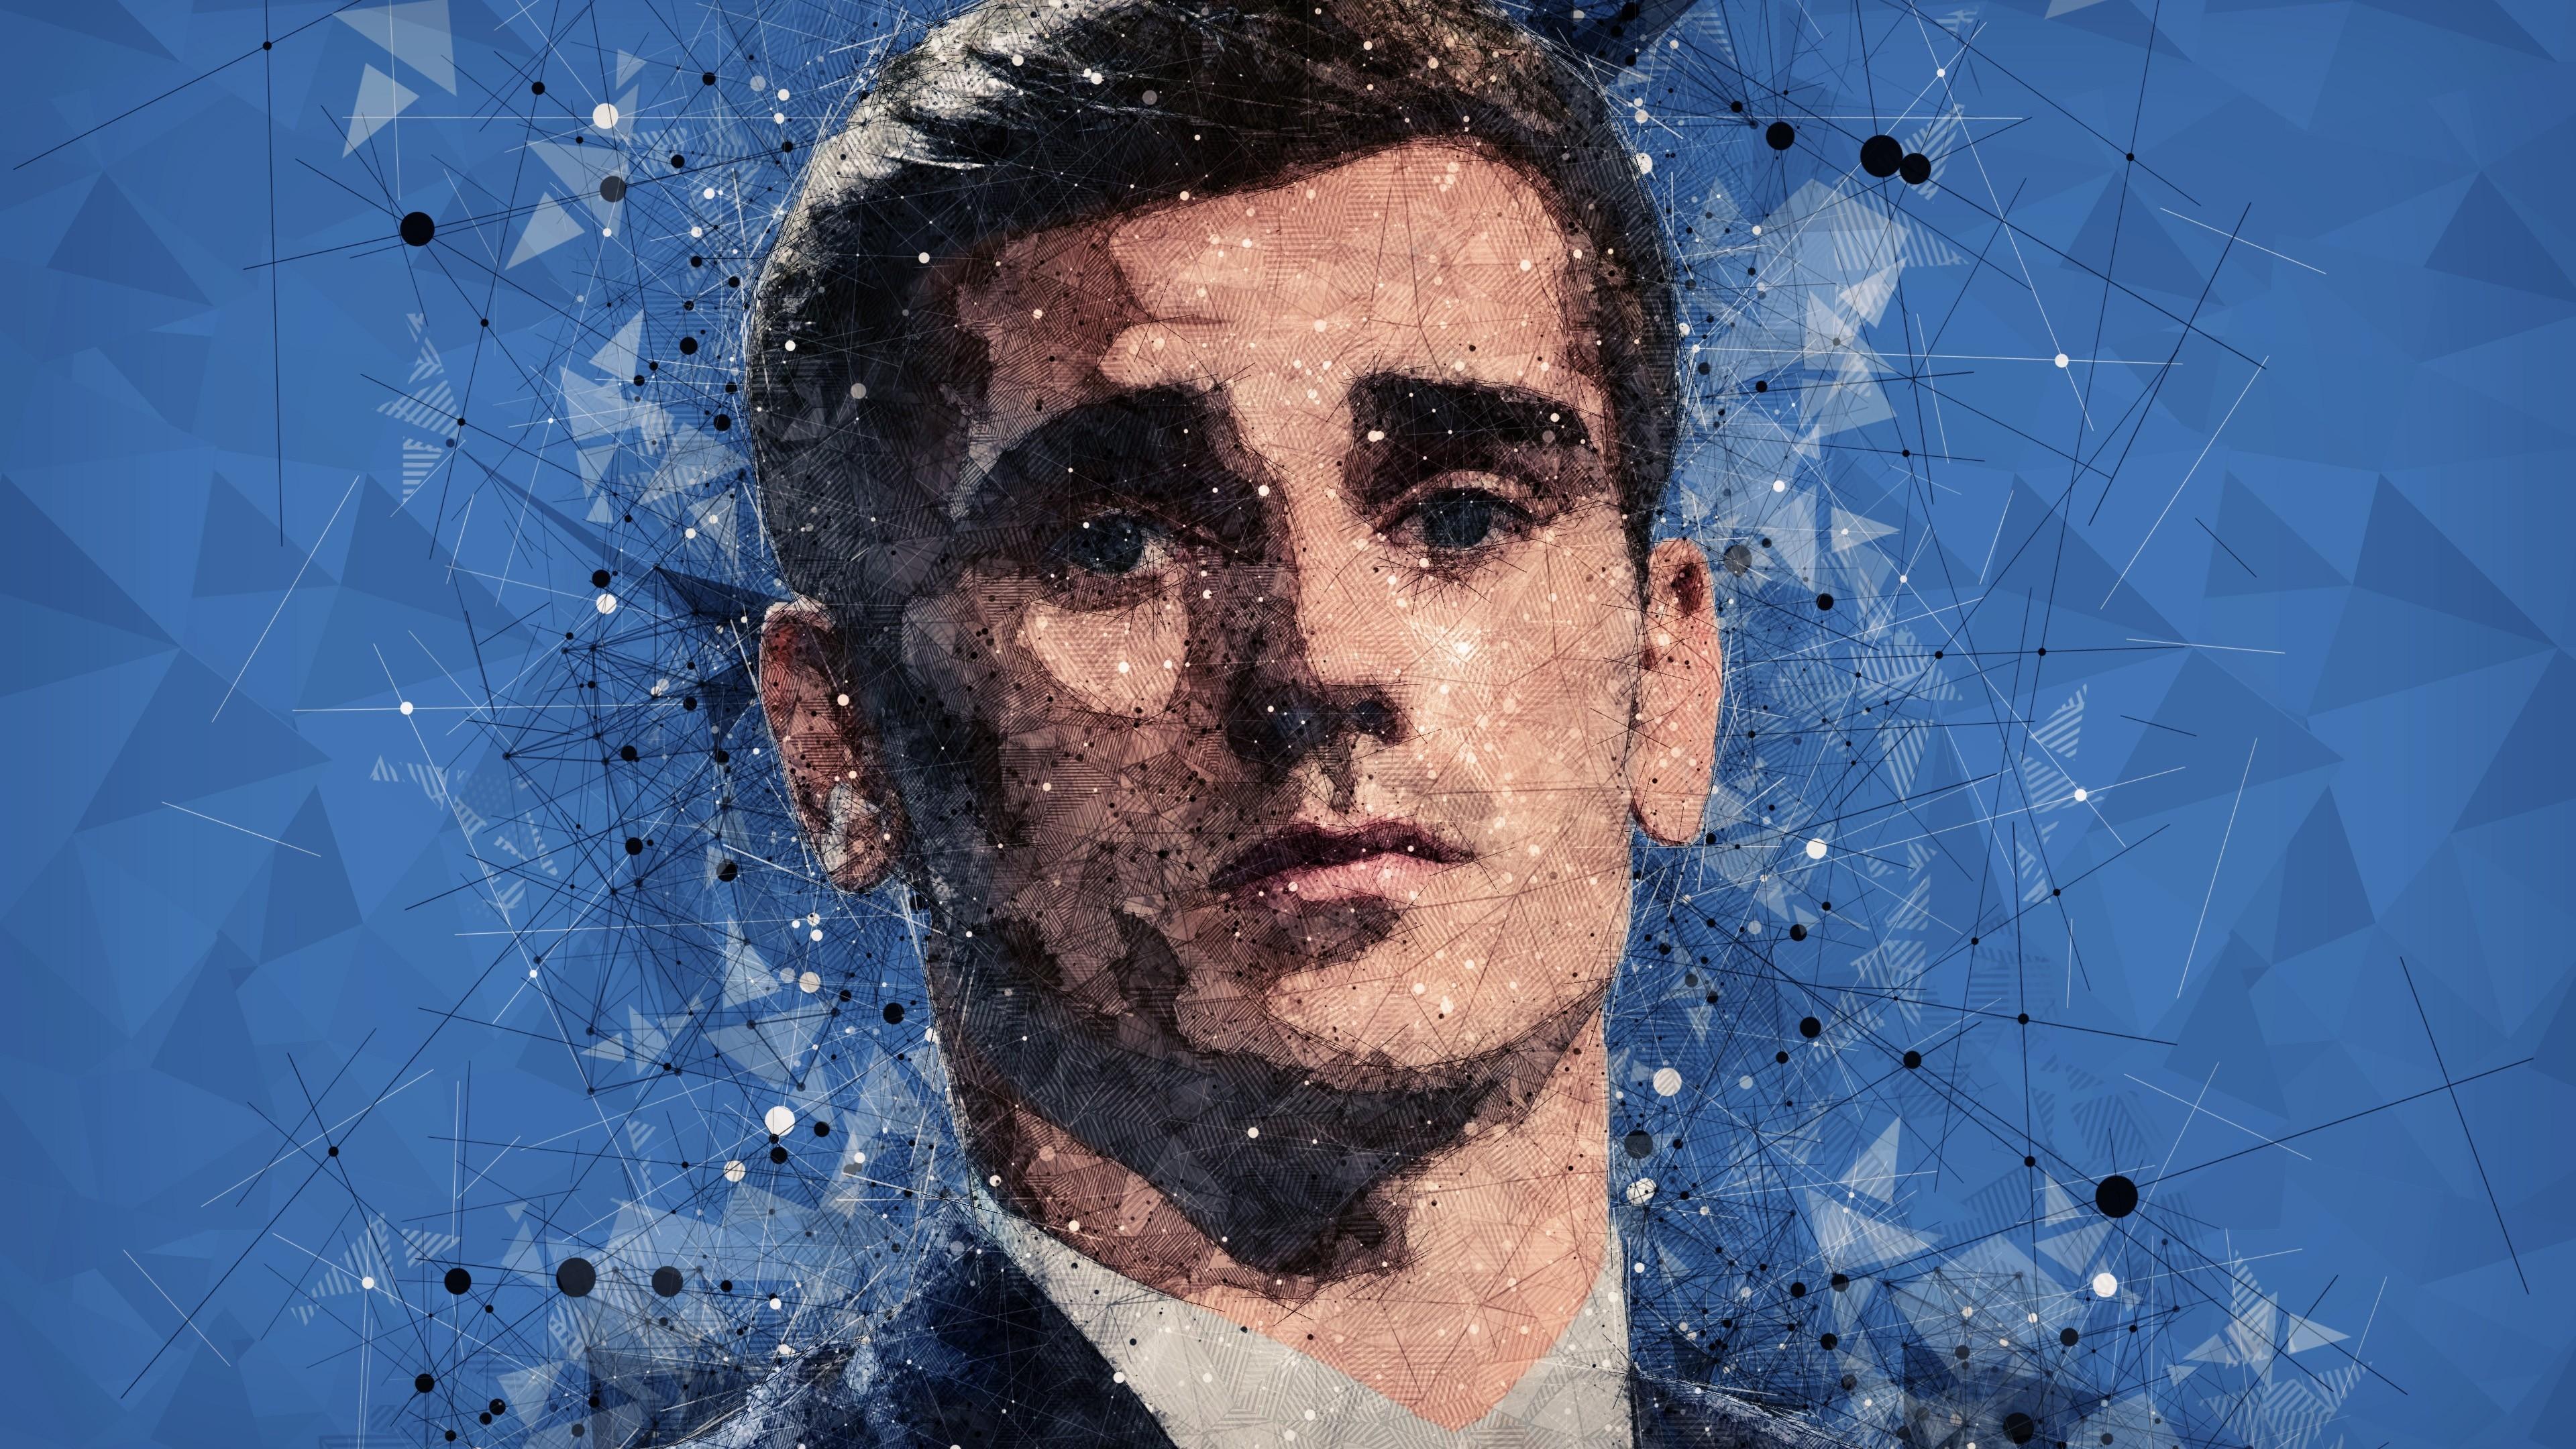 Antoine Griezmann Pixel Art 2363620 Hd Wallpaper